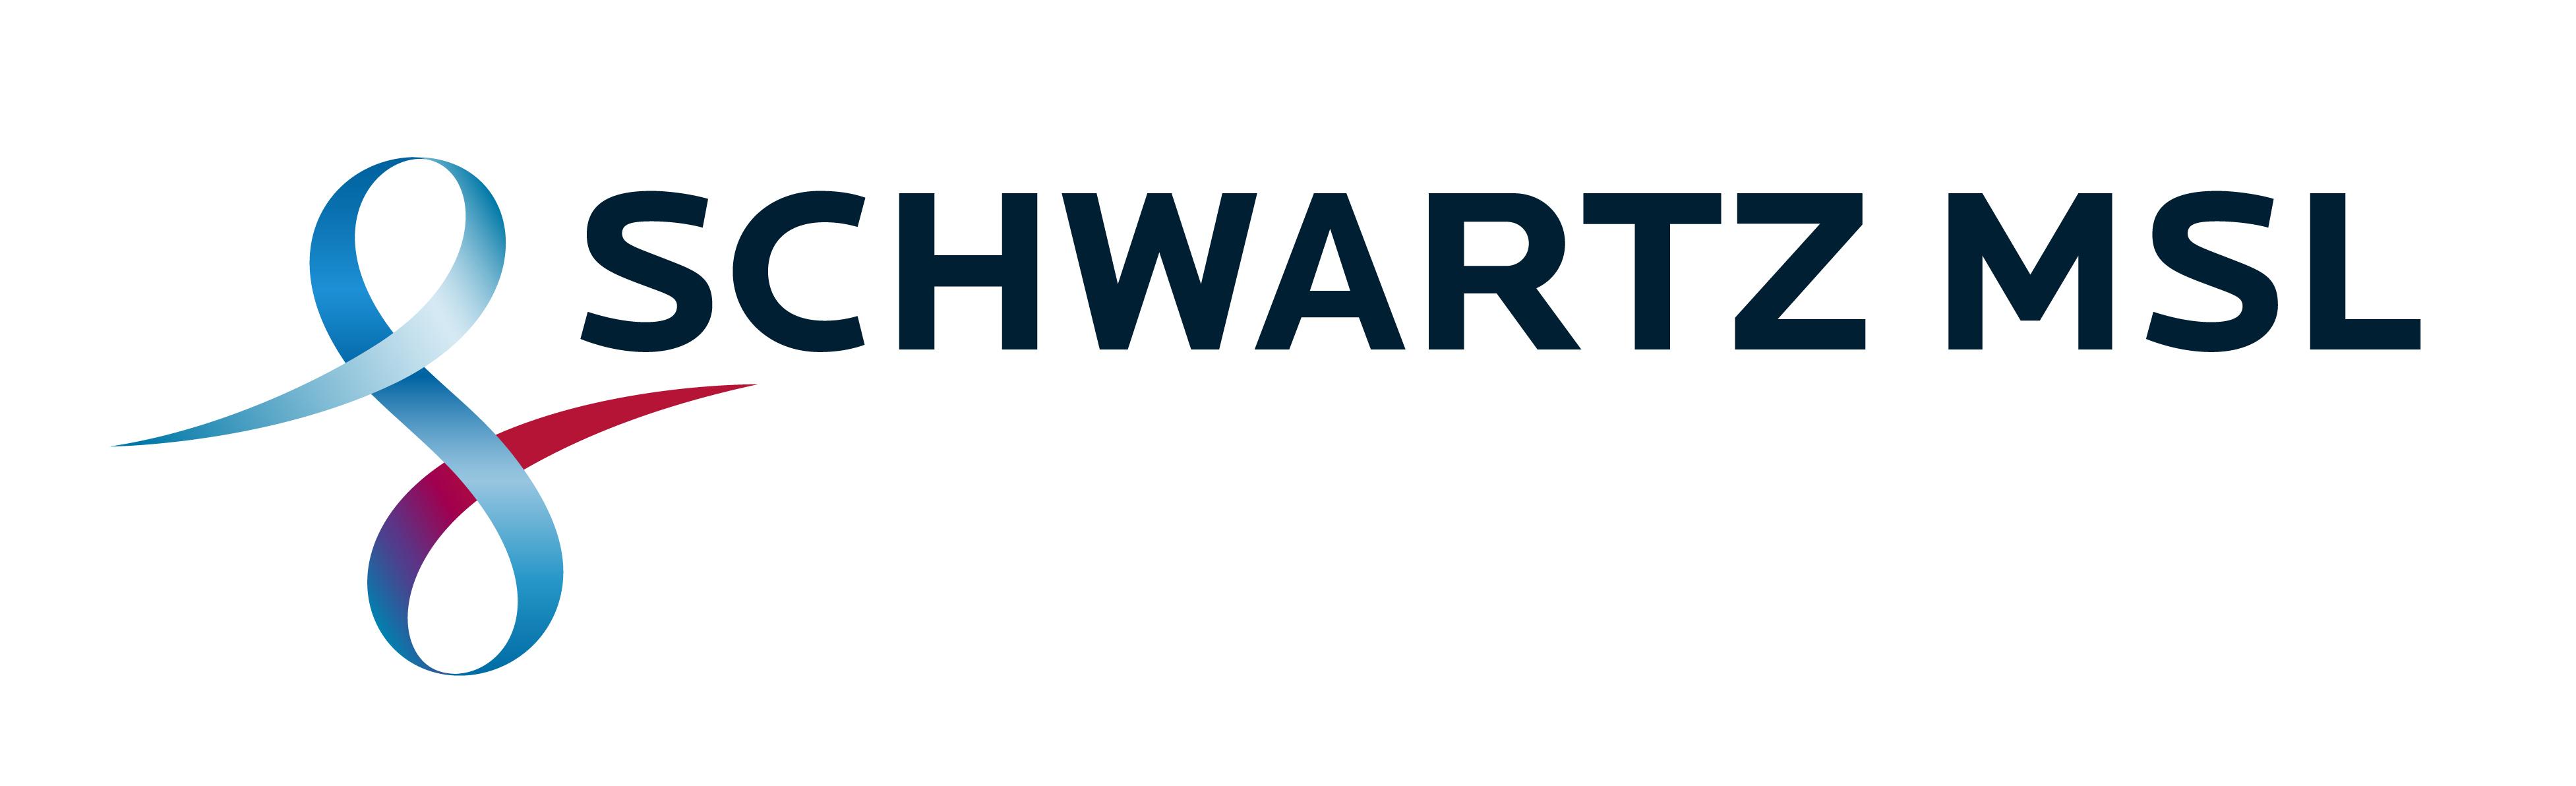 Schwartzmsl.com